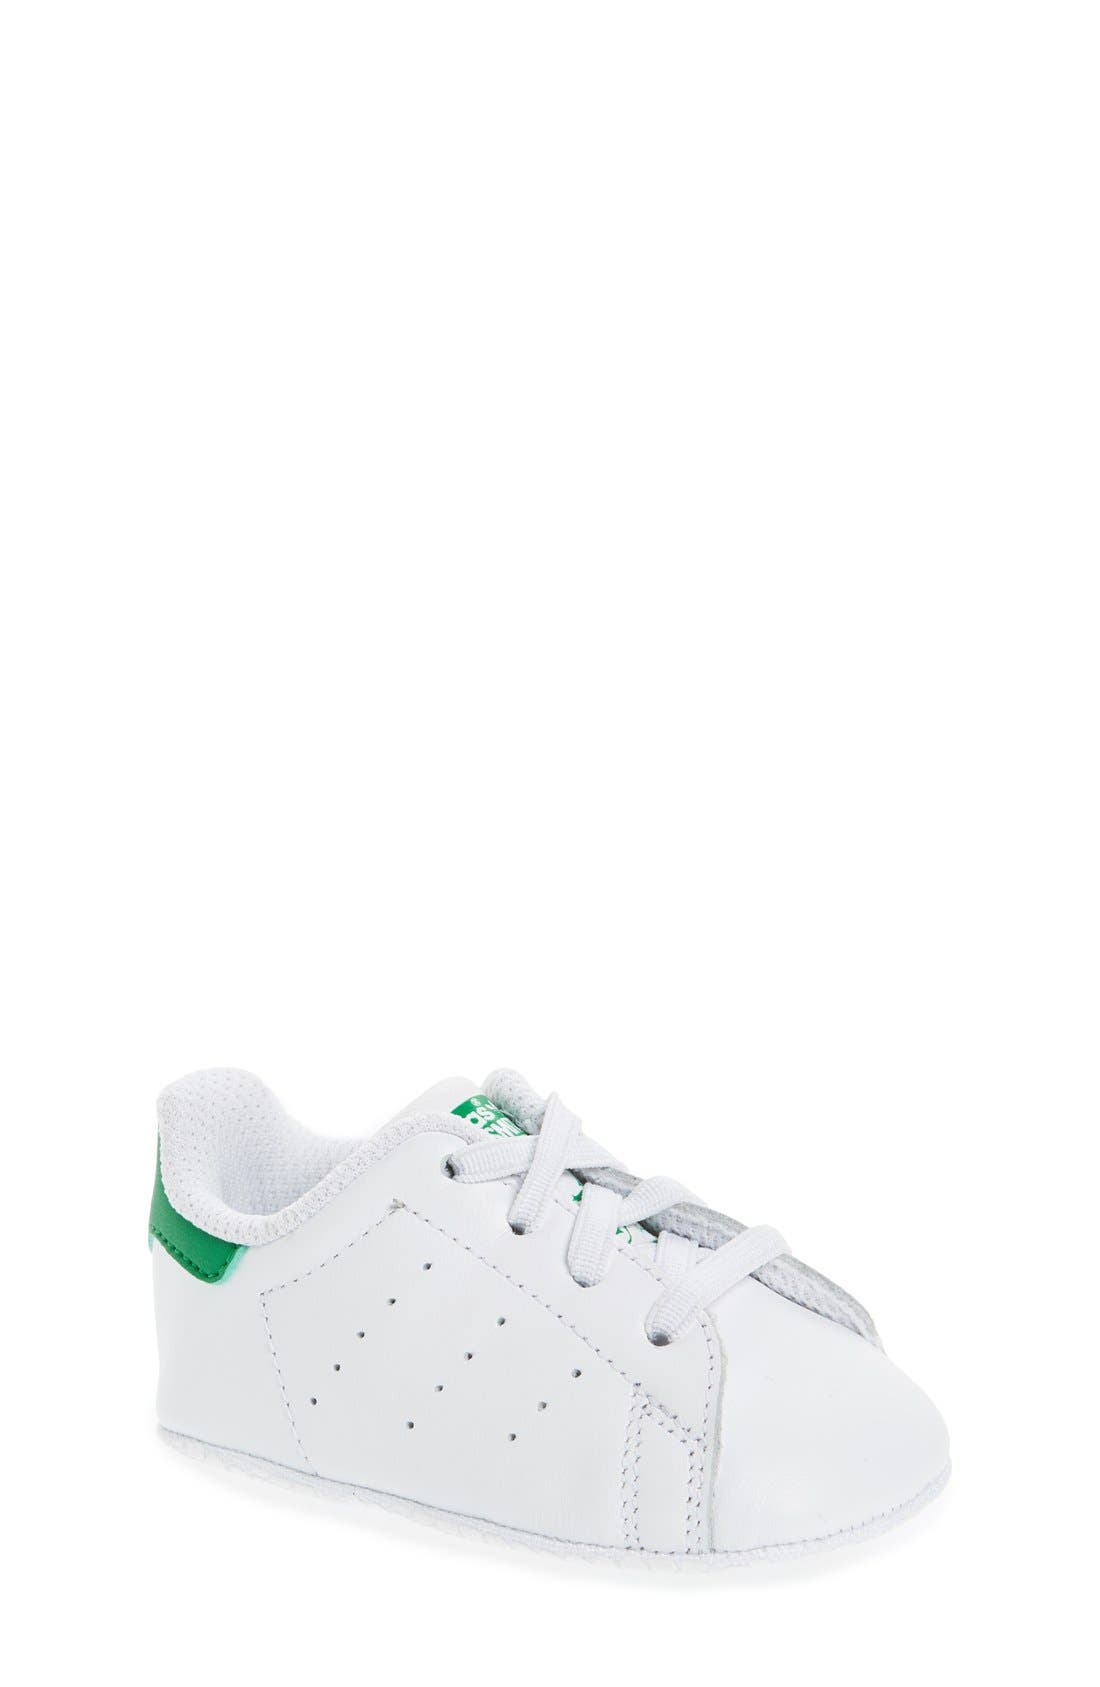 Alternate Image 1 Selected - adidas Stan Smith Crib Sneaker (Baby)